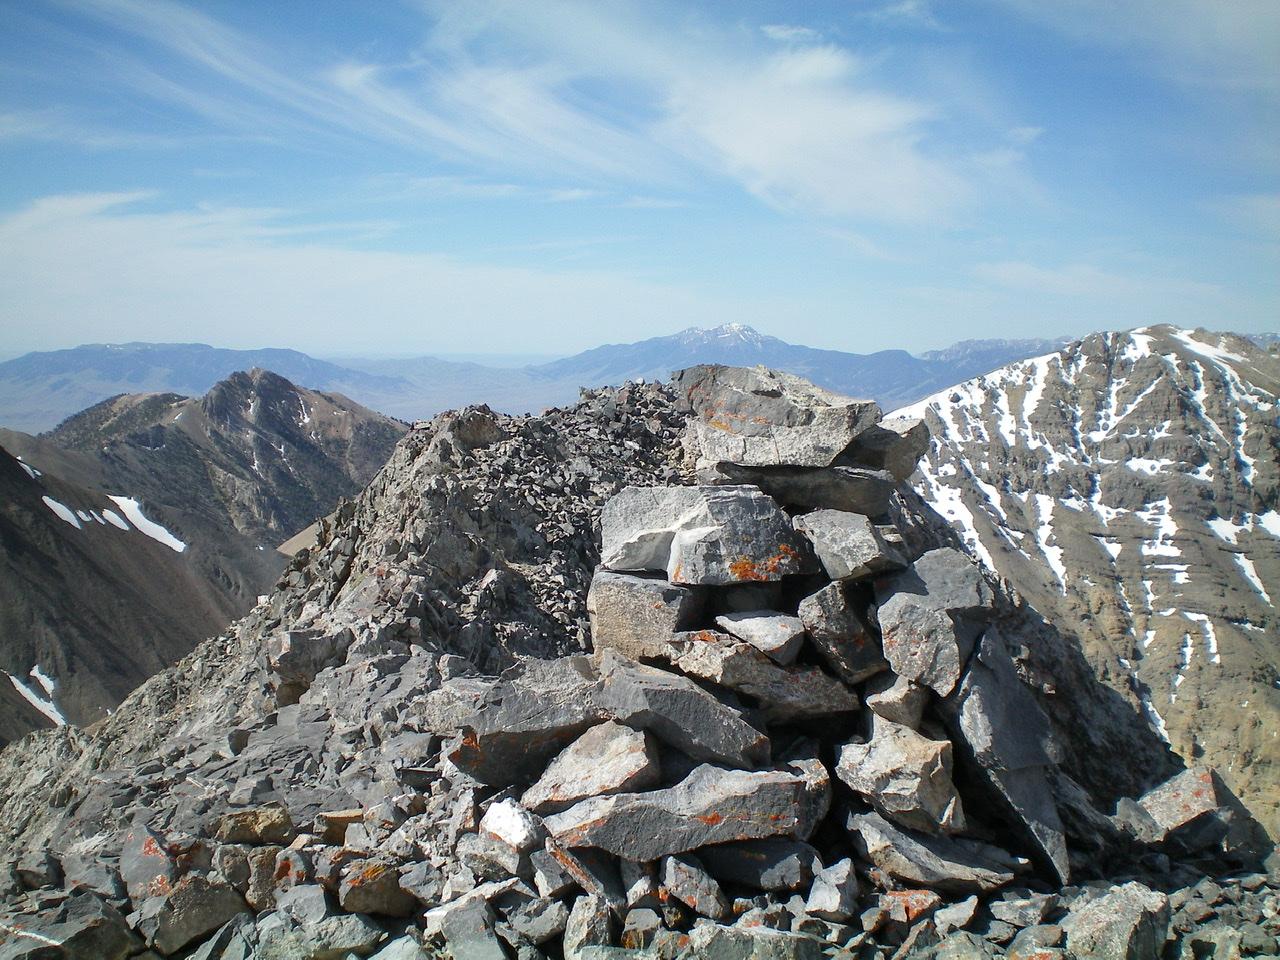 The summit cairn atop Black and White Peak. Livingston Douglas Photo